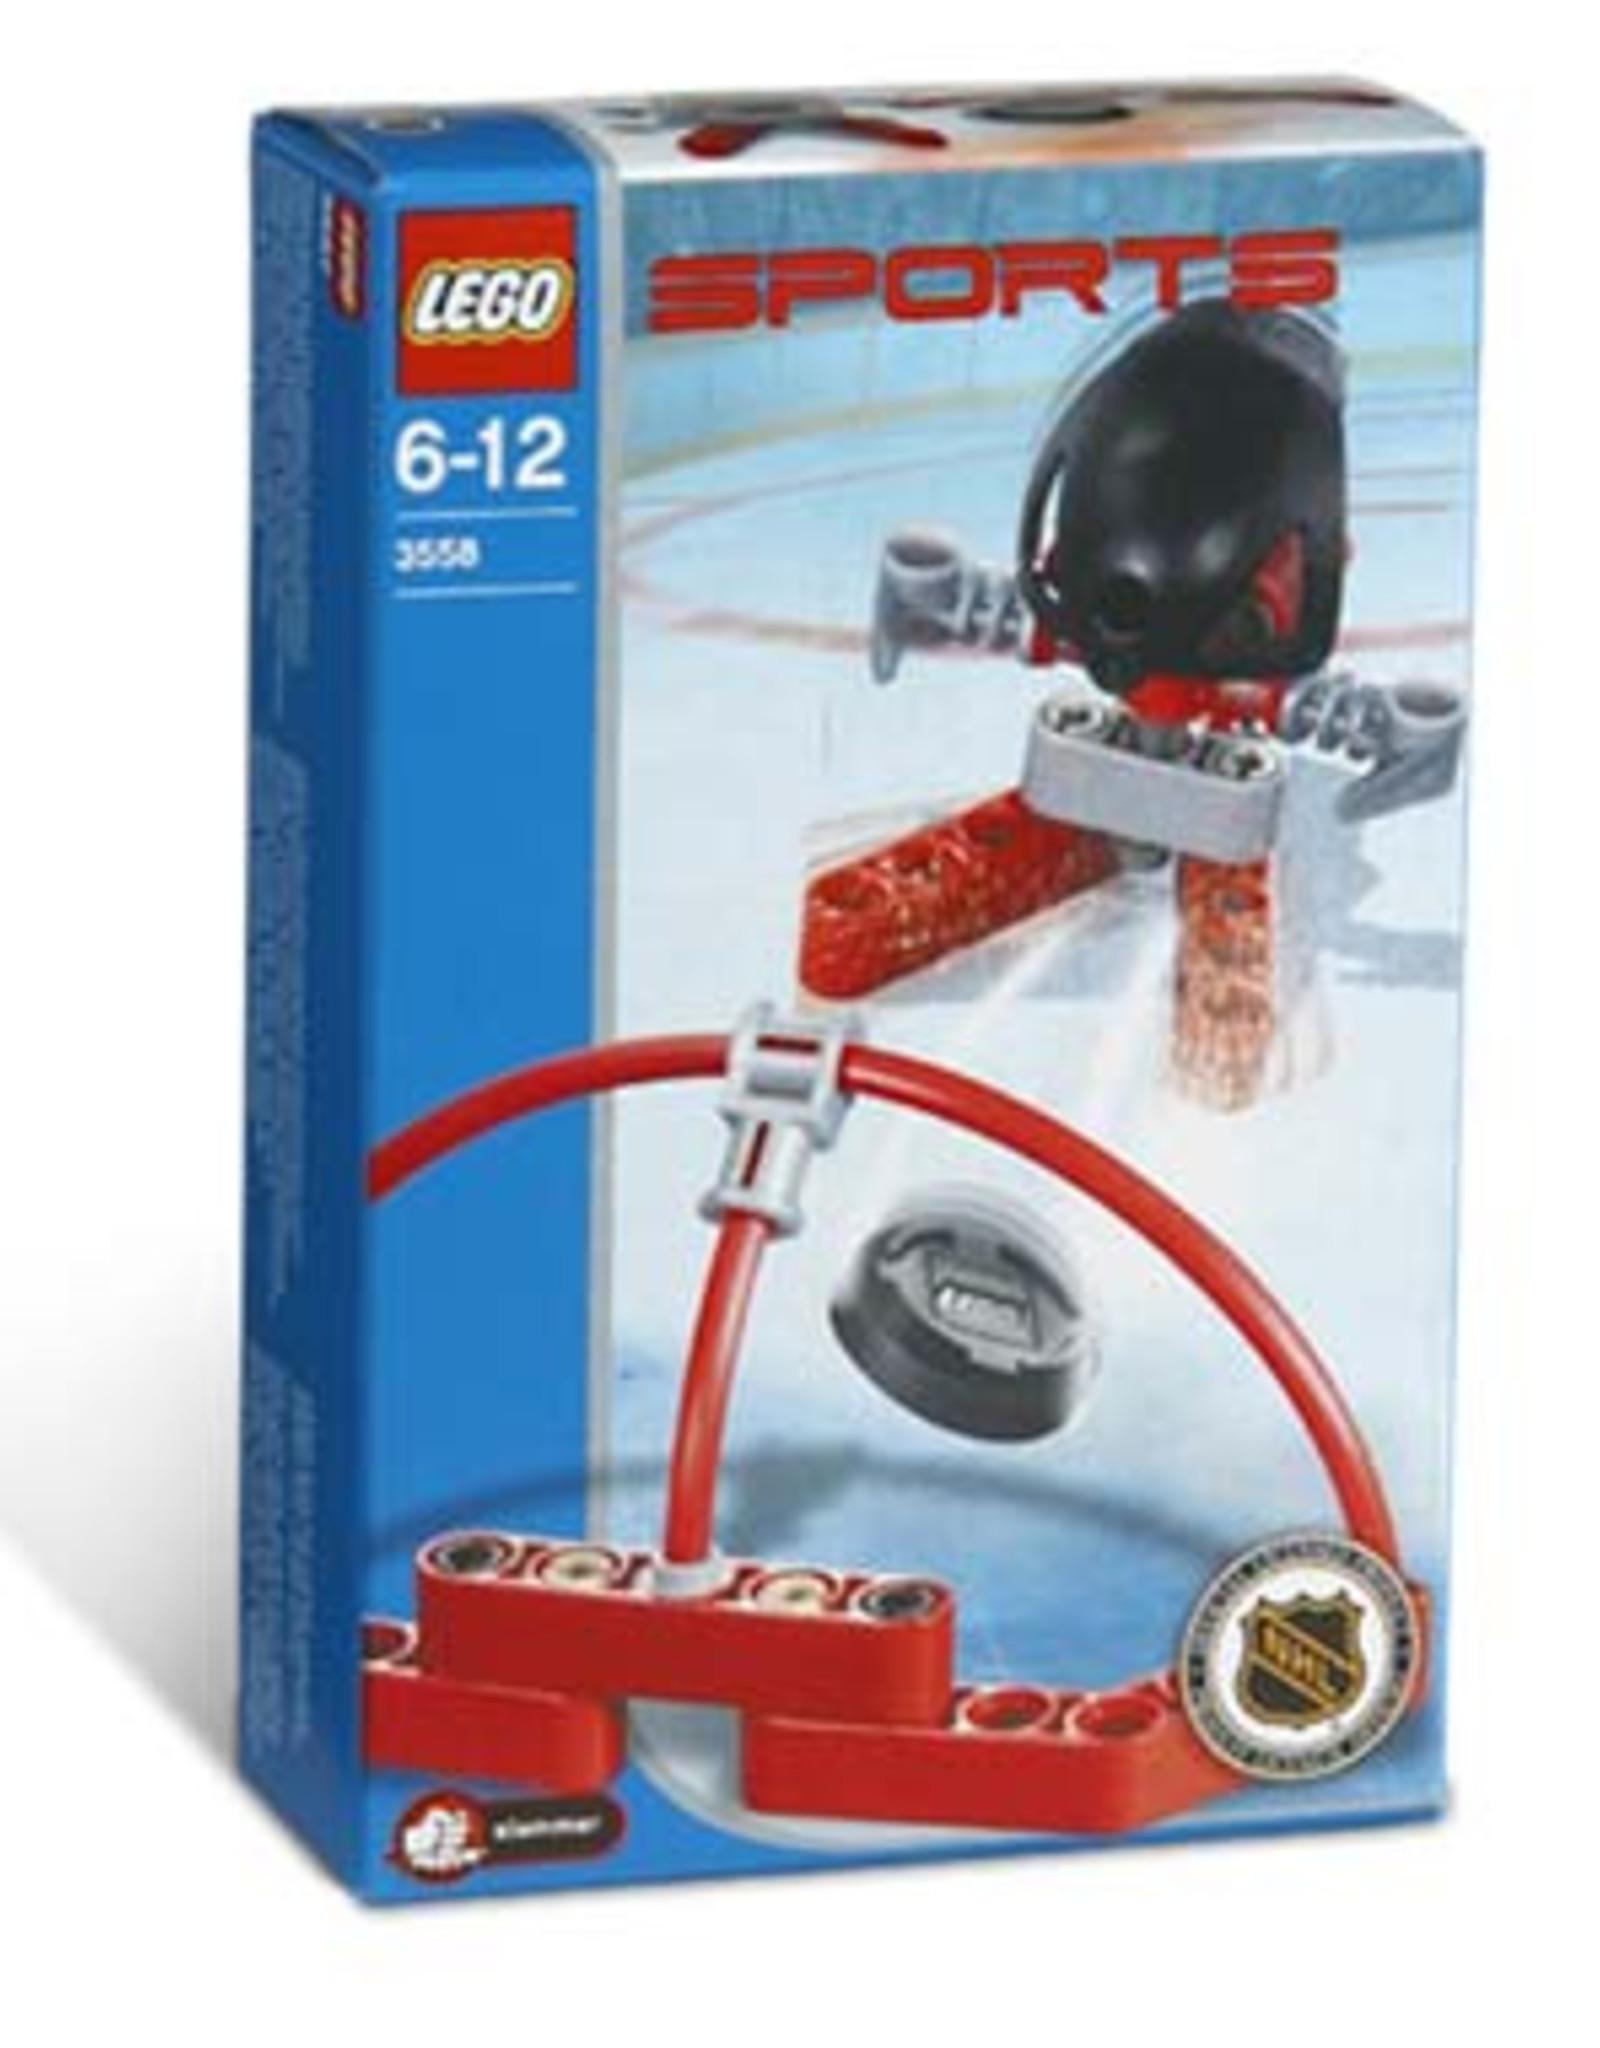 LEGO LEGO 3558 Ijshocker rood SPORTS